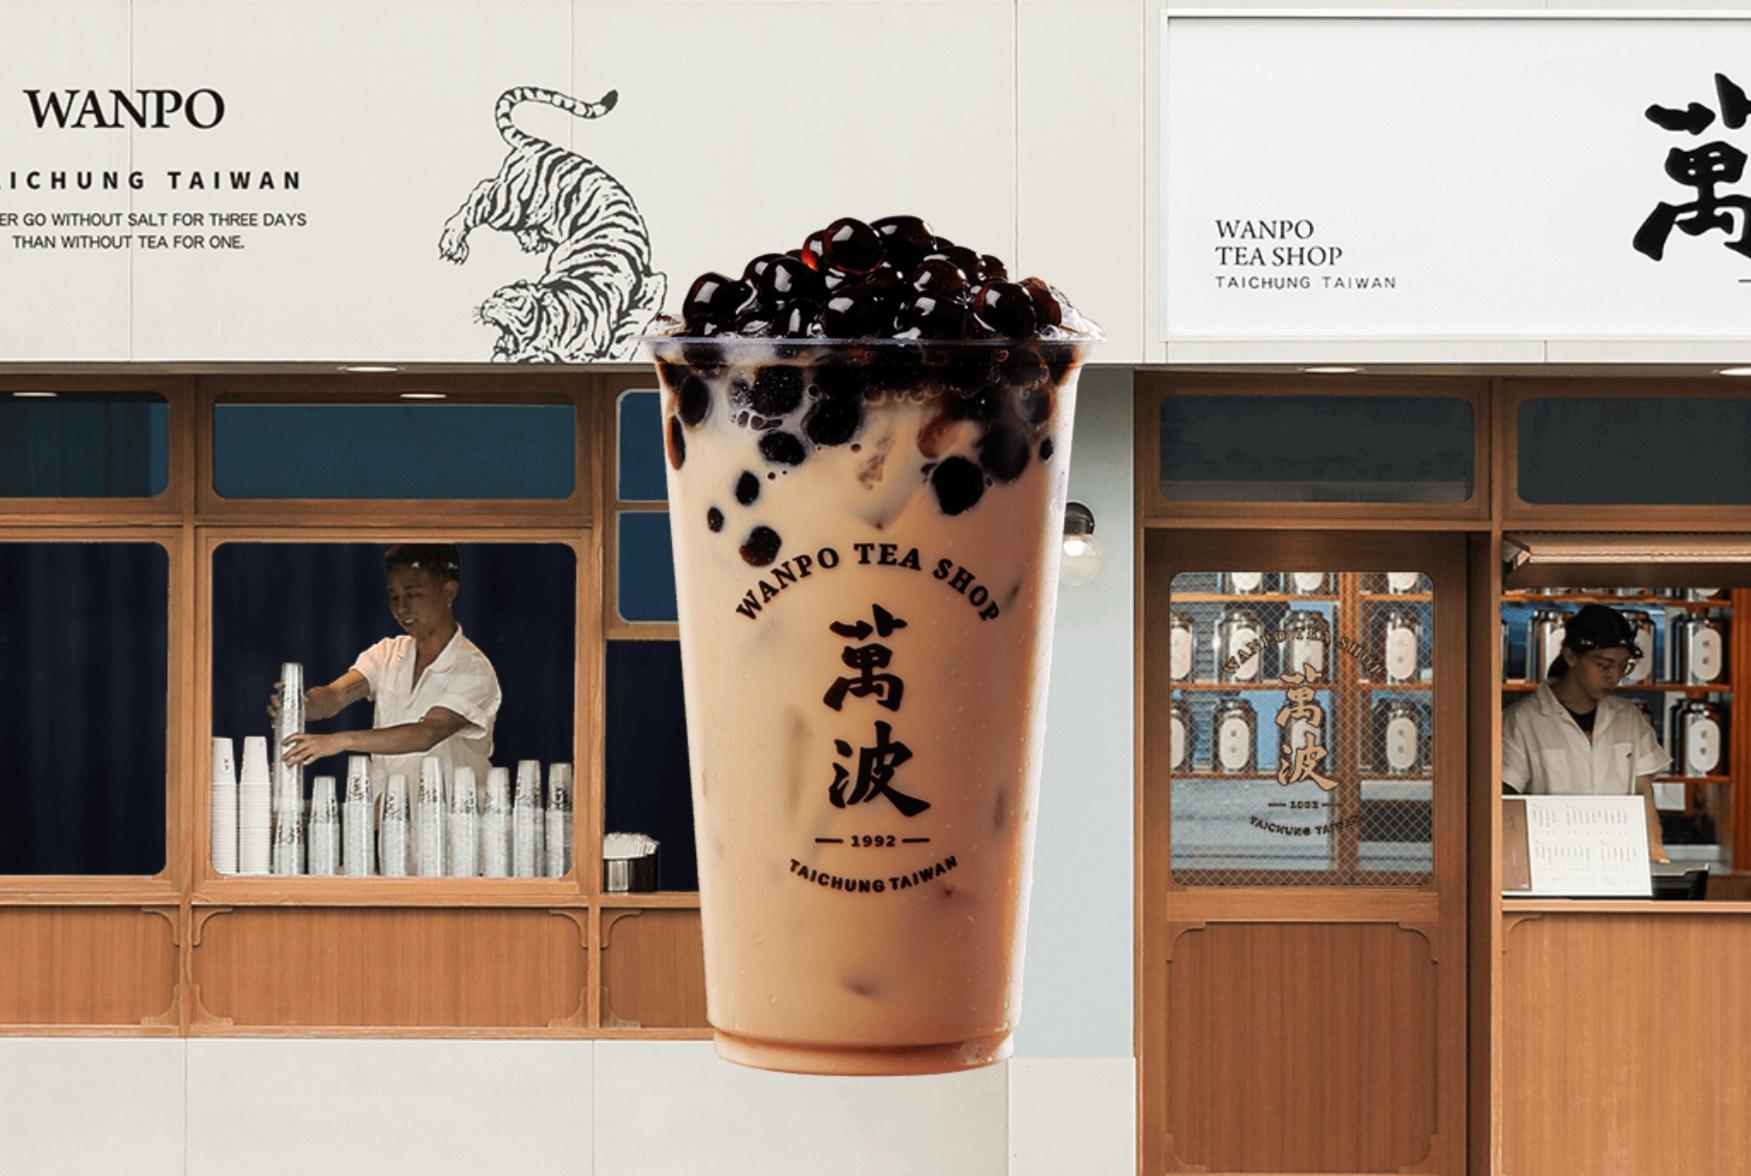 wanpo tea shop